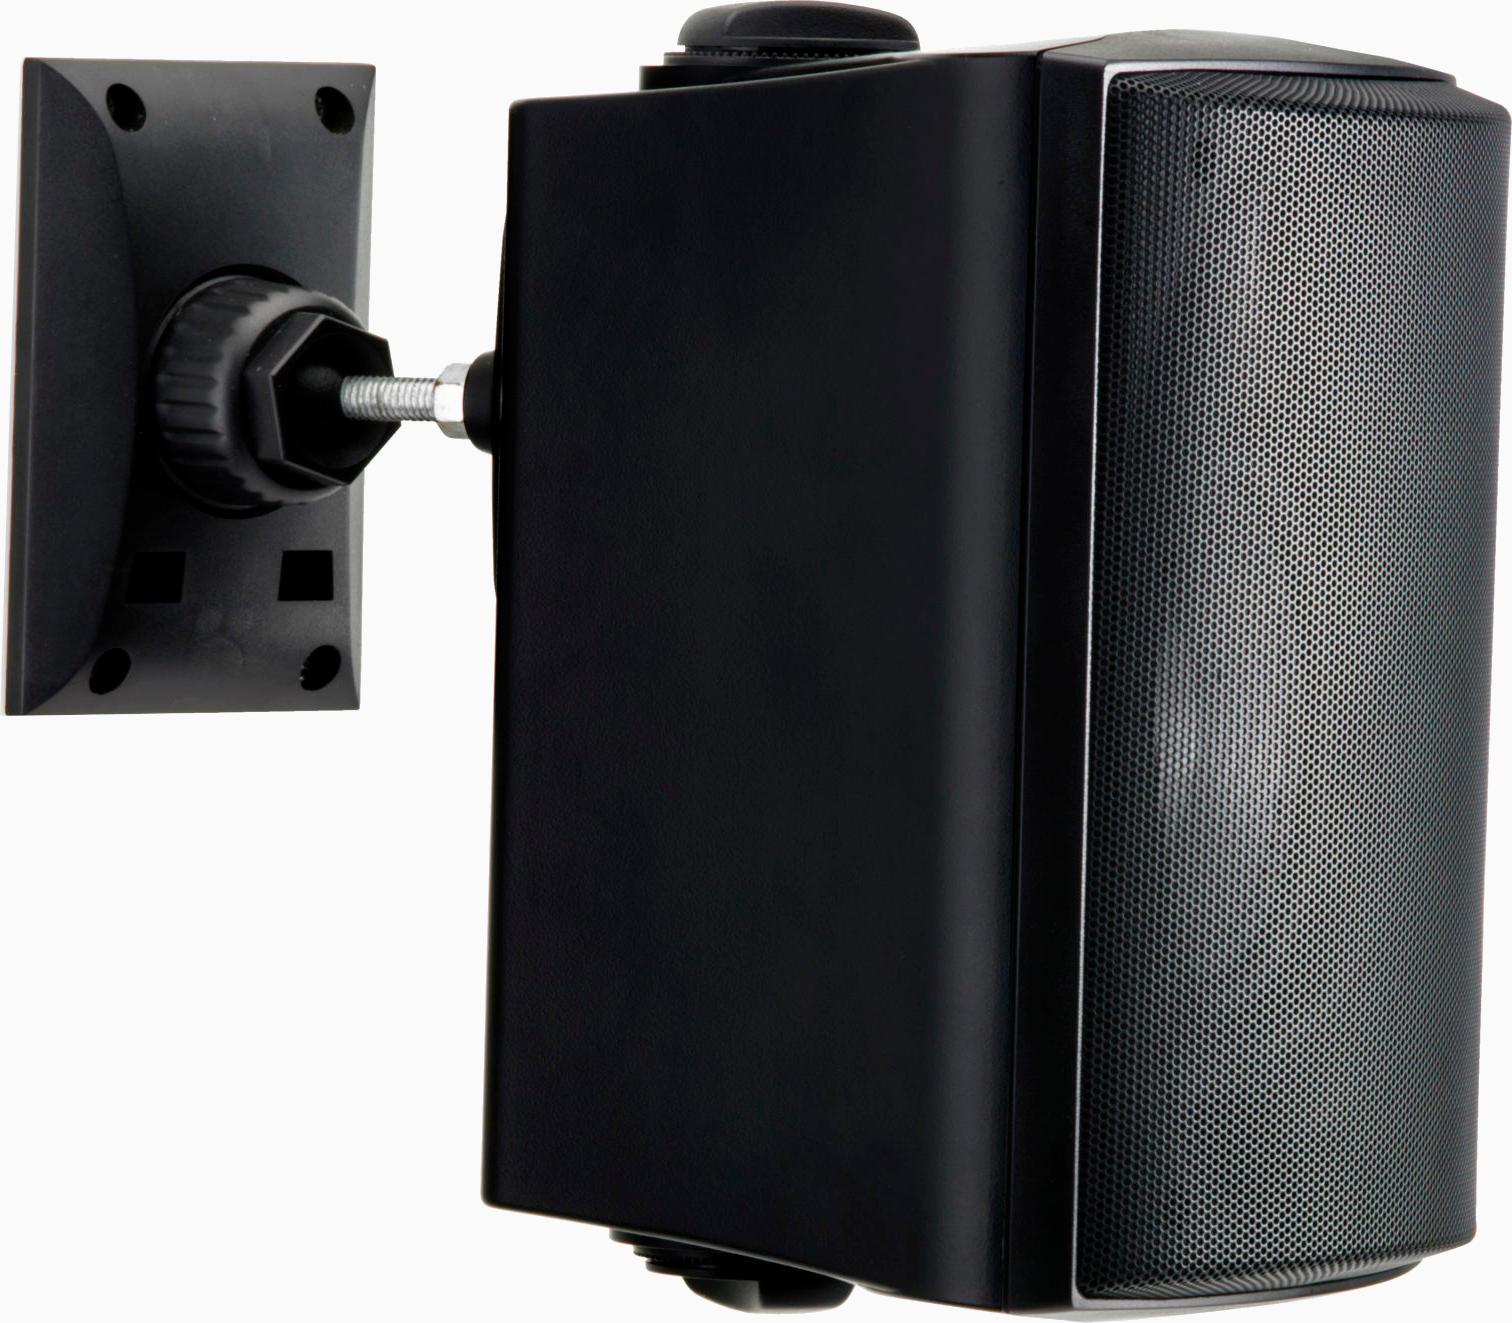 ZEF17-product.jpg